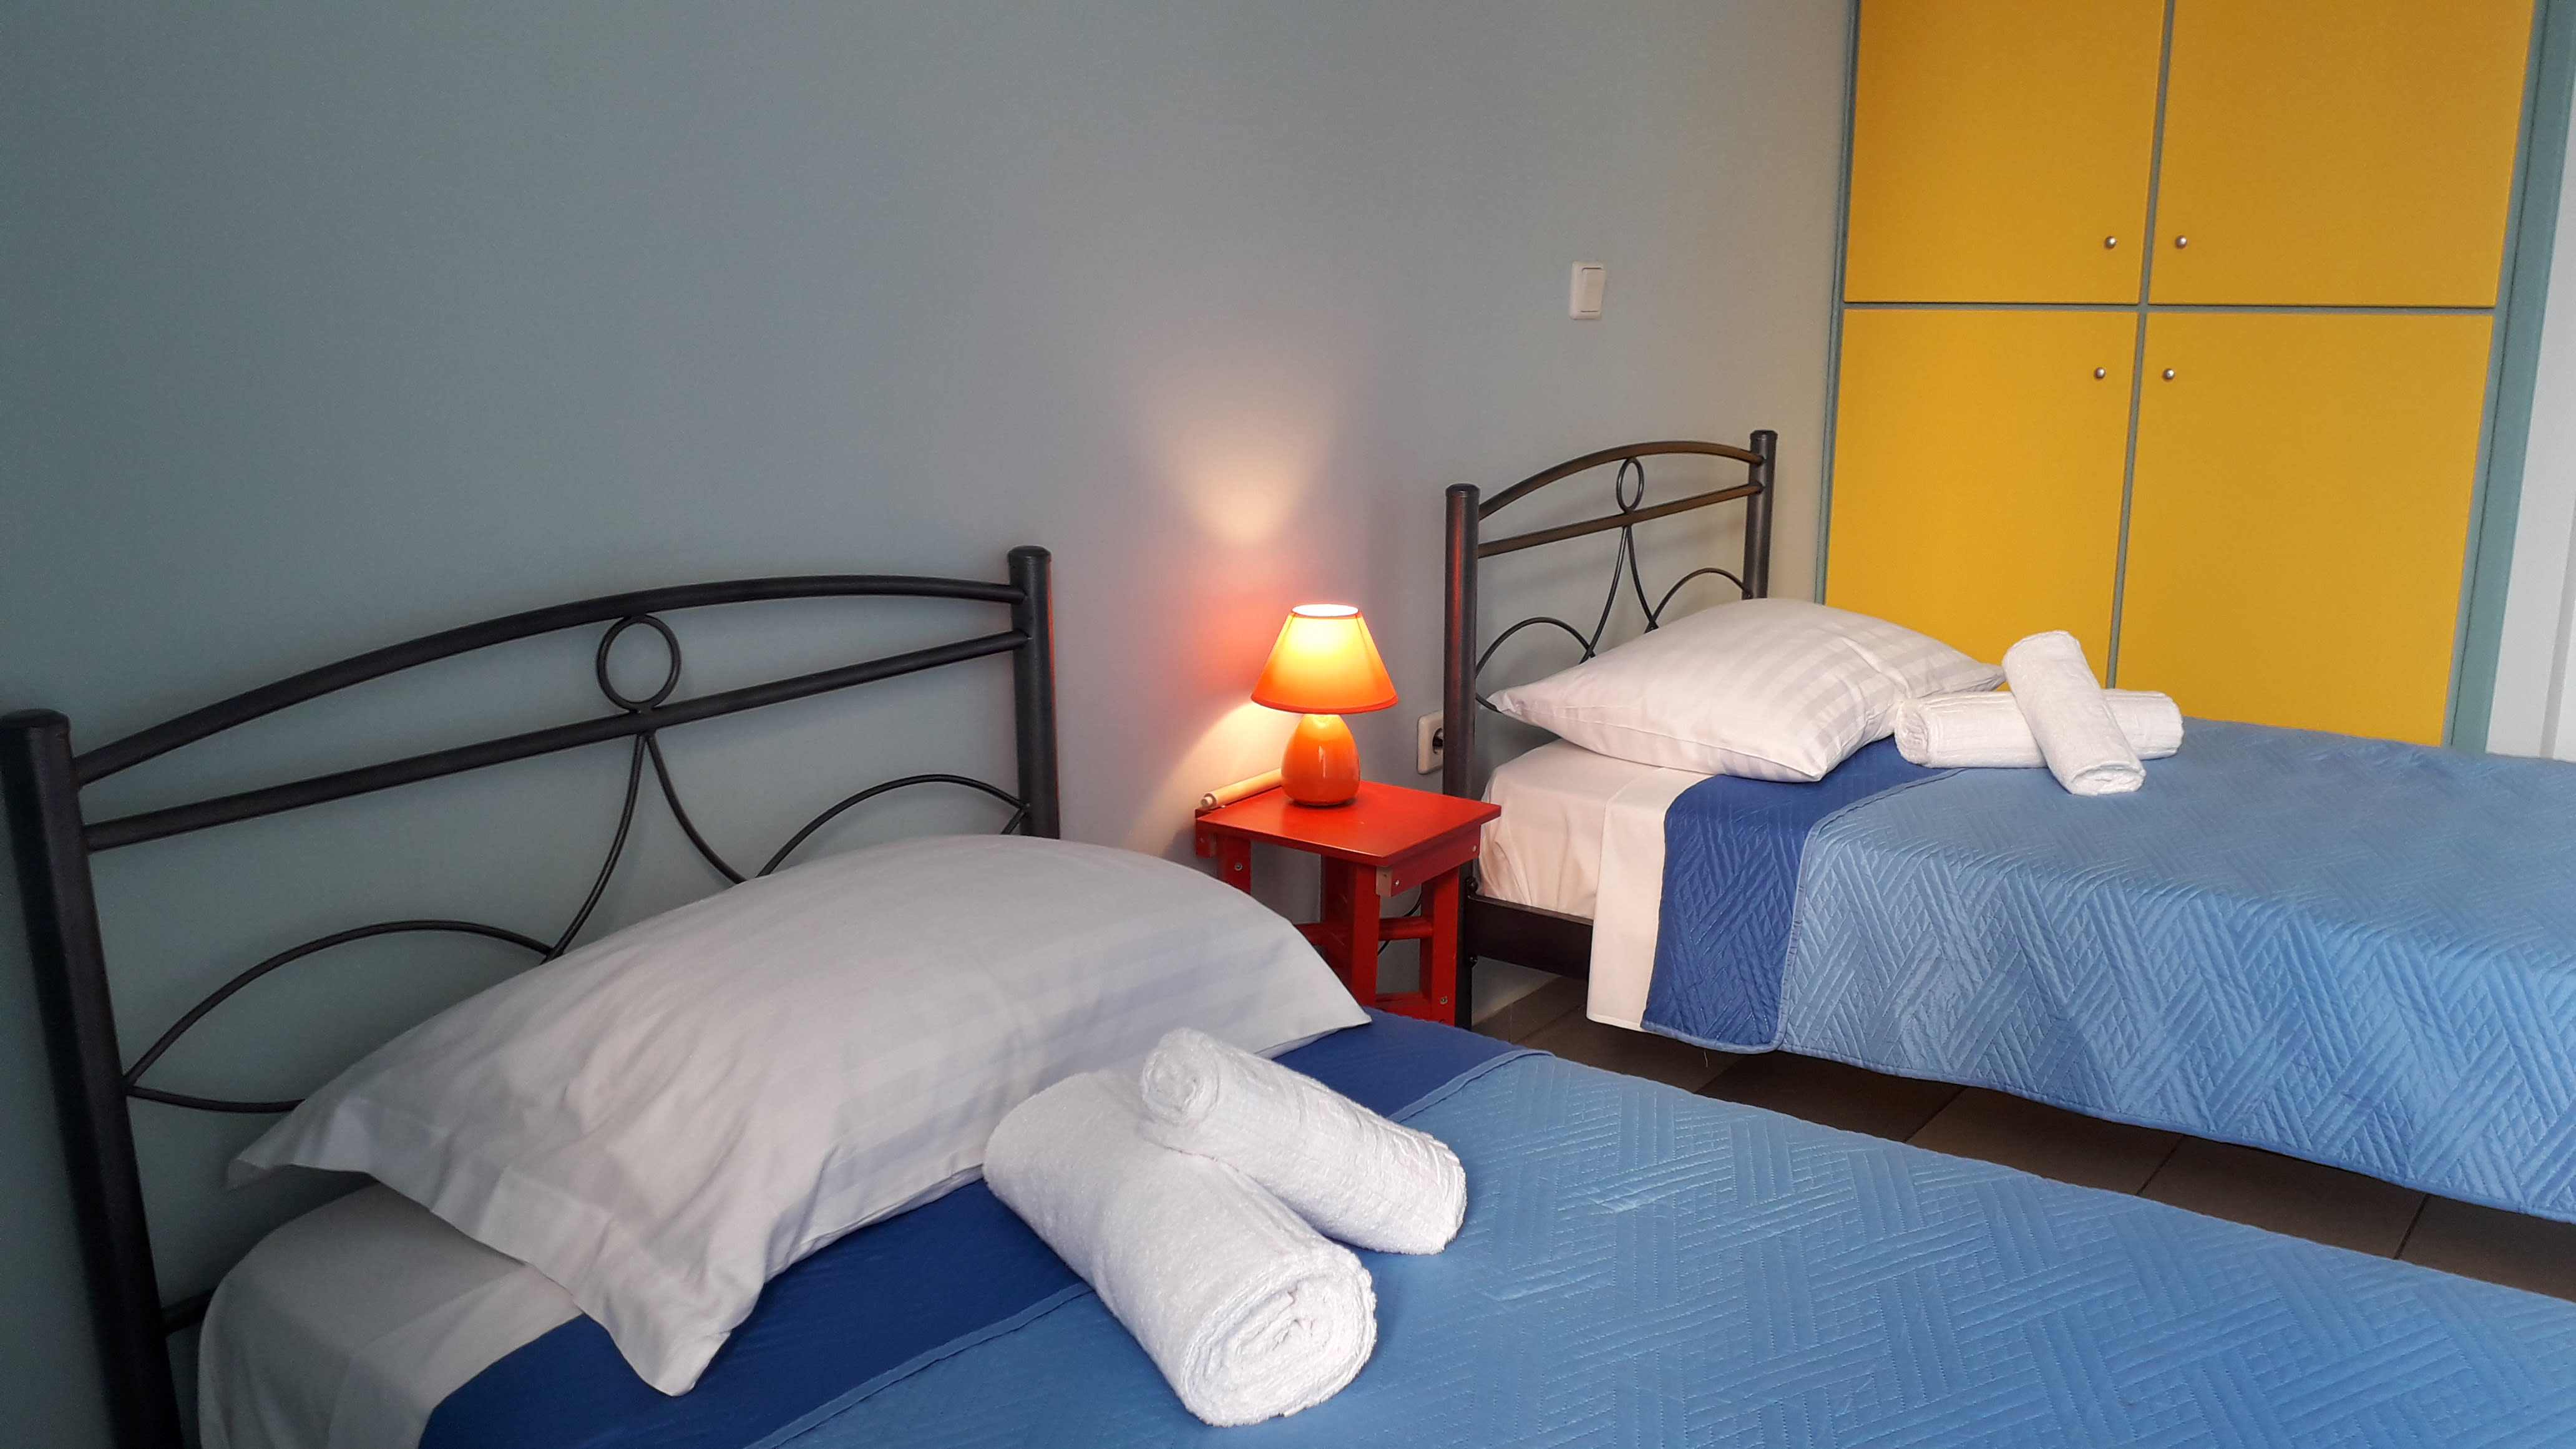 HOSTEL - Welcommon Hostel